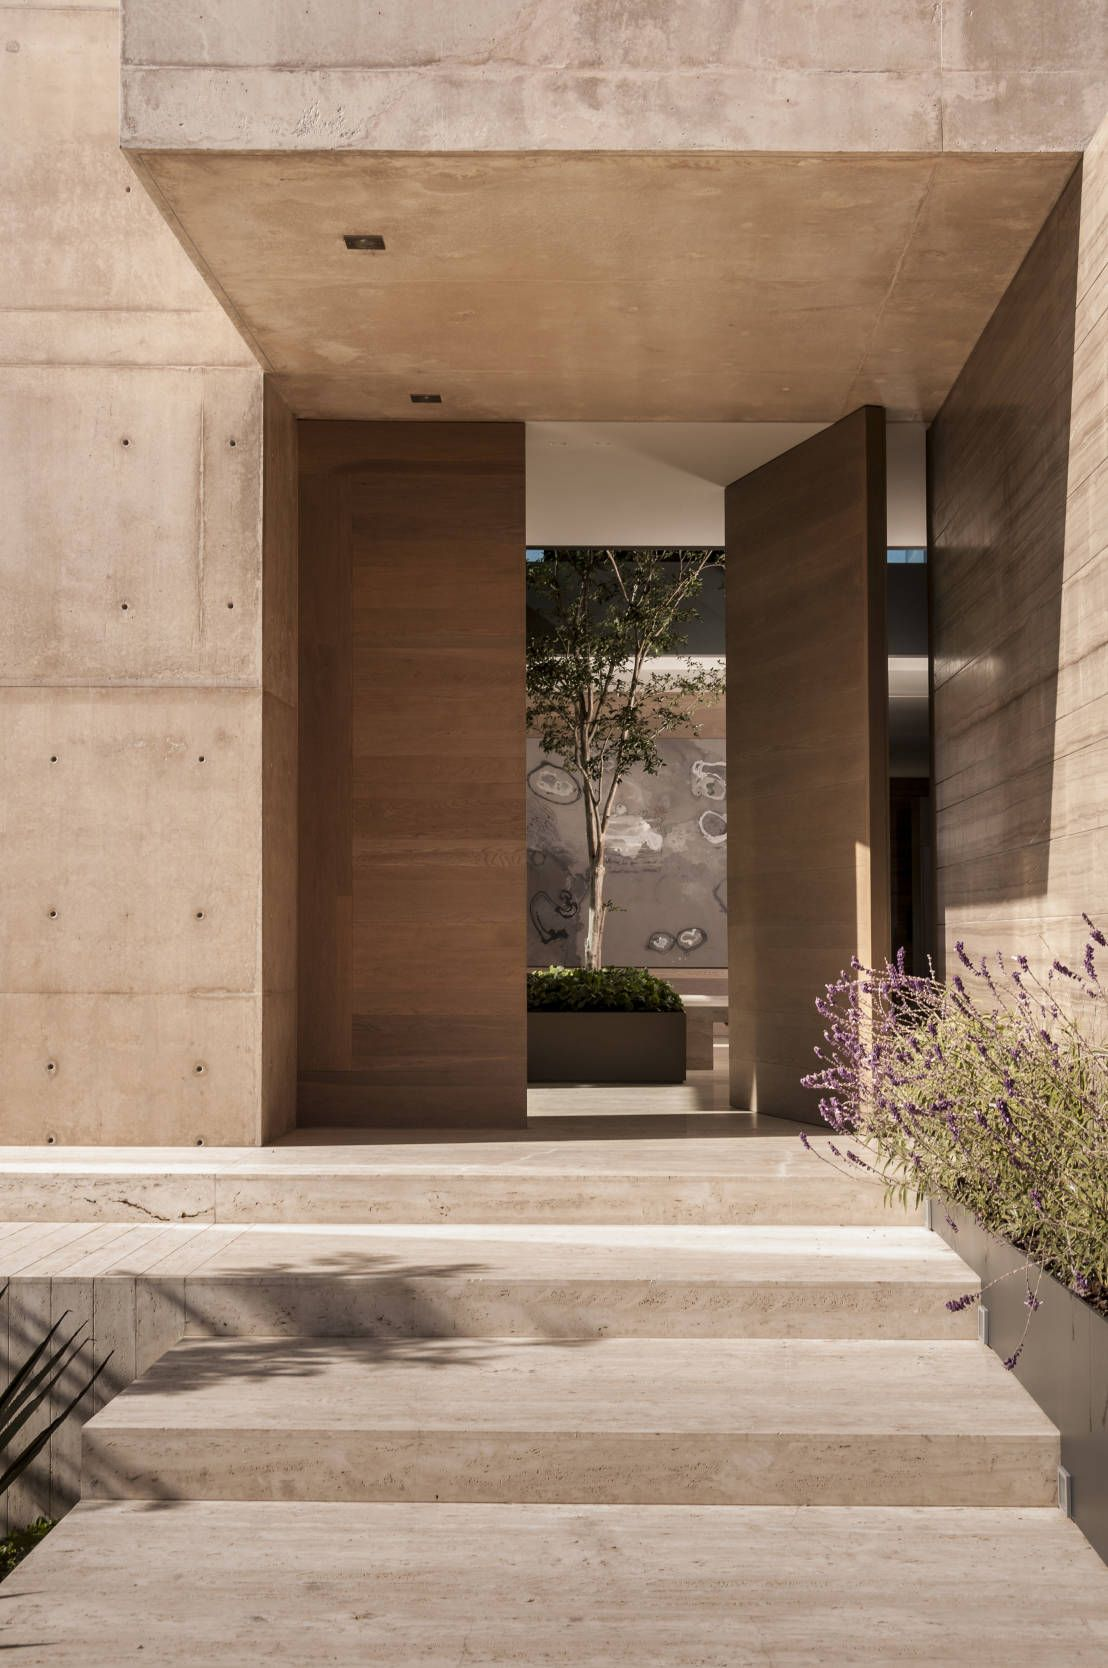 Casa ml puertas y ventanas modernas de gantous - Arquitectos casas modernas ...